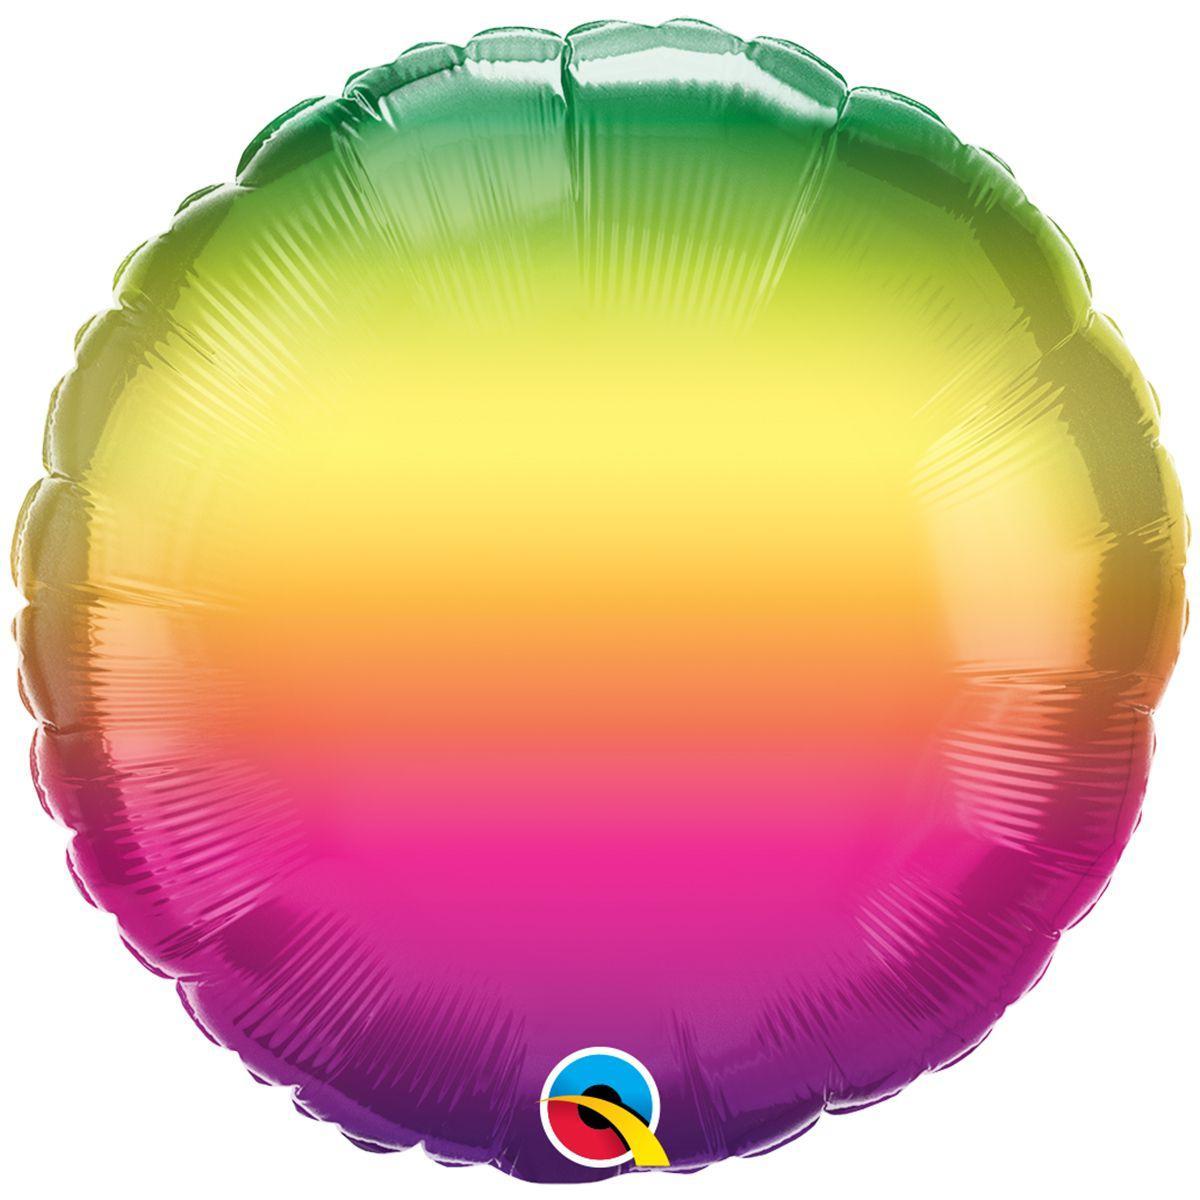 "Кулька 18"" круг фольгована, омбре райдуга веселка УП шт."